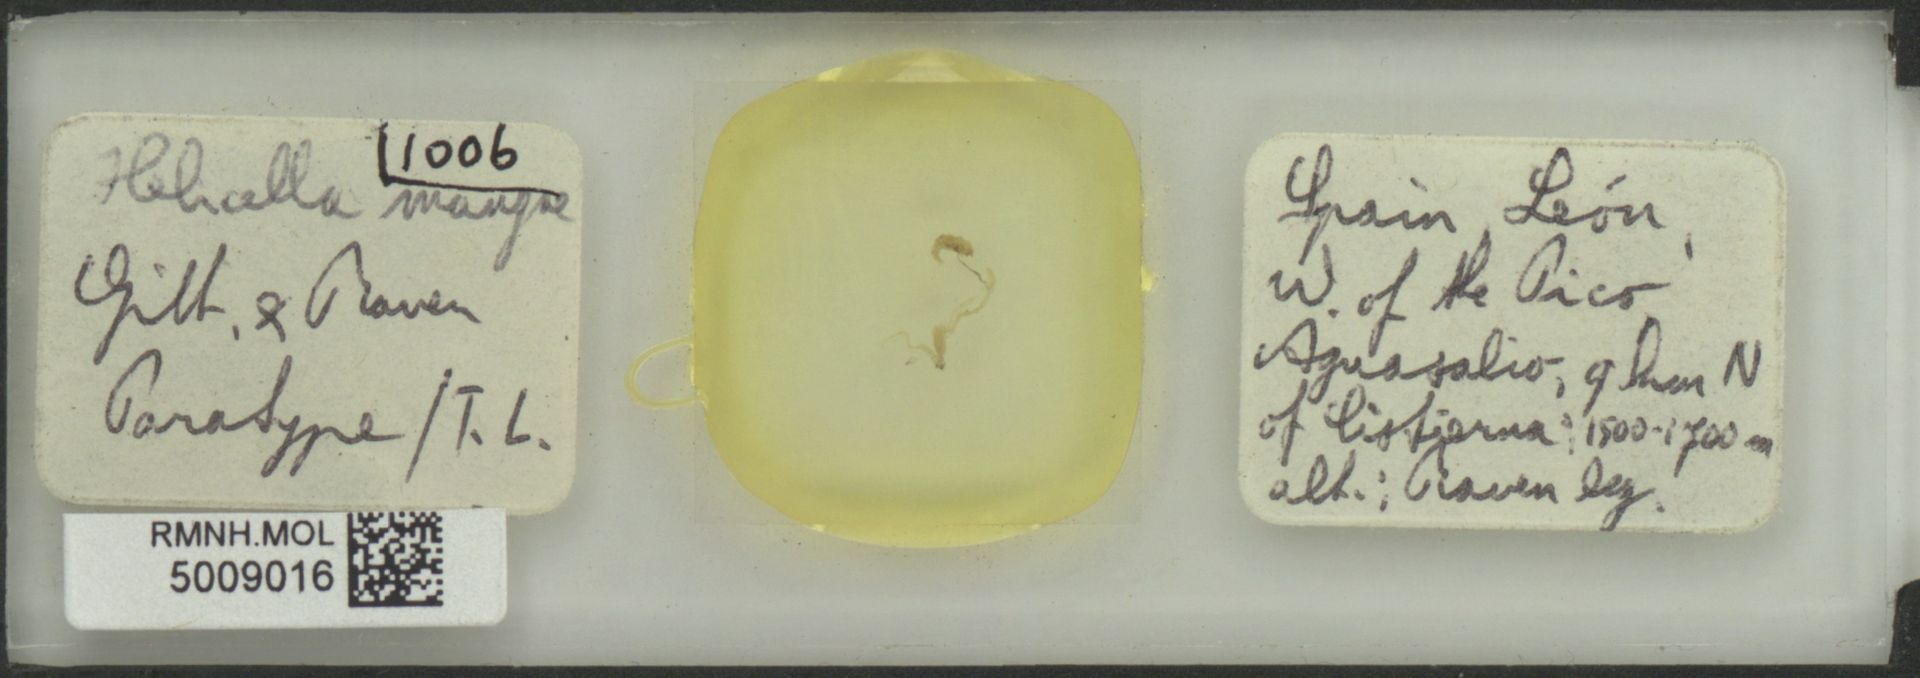 RMNH.MOL.5009016 | Helicella mangae Gittenberger & Raven, 1982